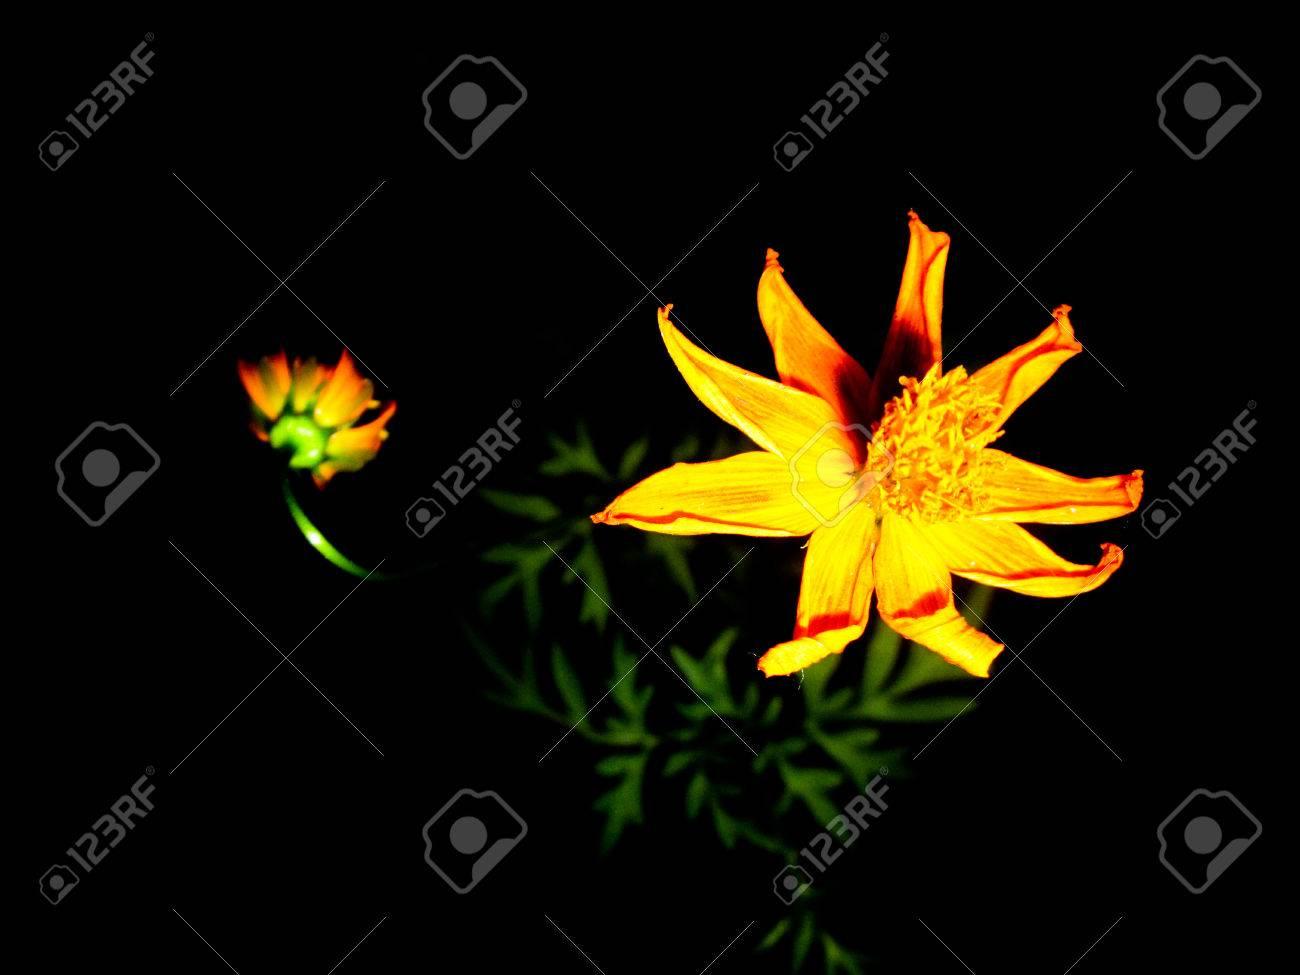 Yellow Flower On Night Black Background Dark Flower Wallpaper